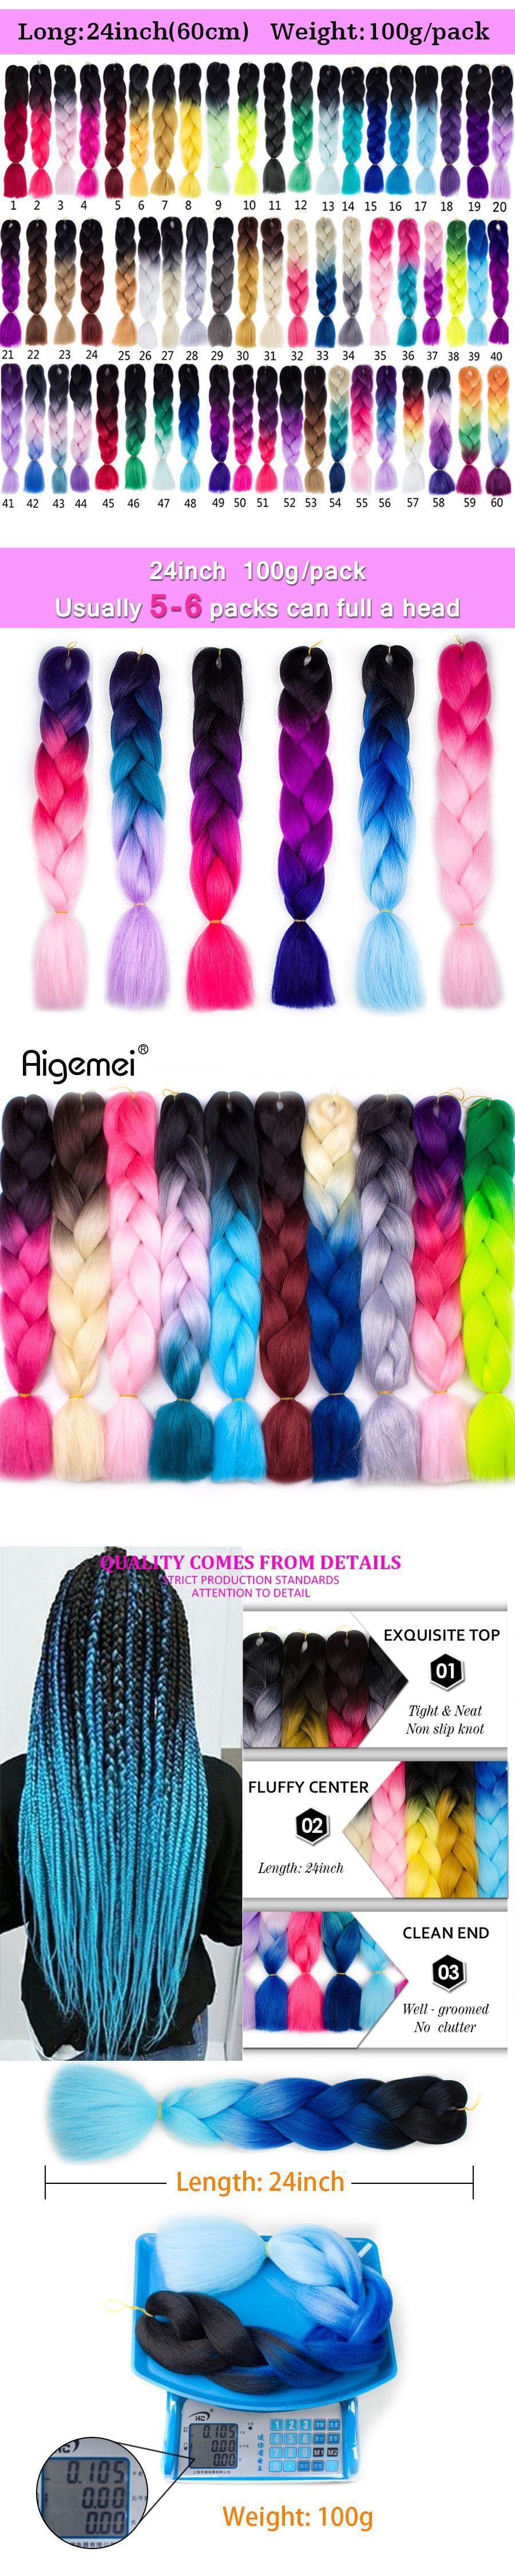 Aigemei Hair Synthetic Crochet Braids Hair Extensions Kanekalon Braiding Hair Extension 24inches Ombre Jumbo Braids 100g/pack